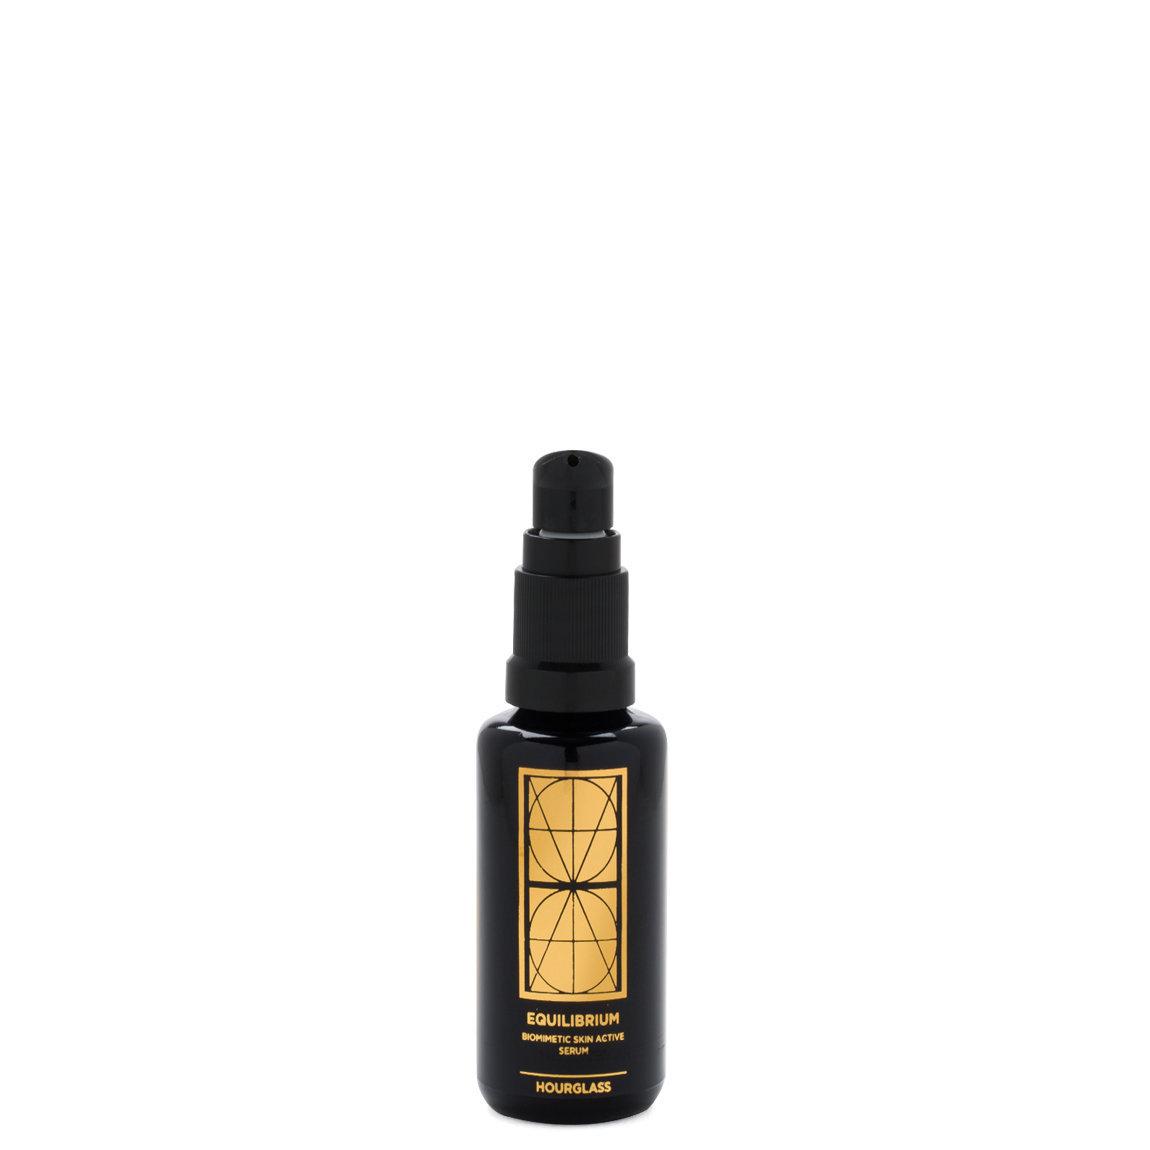 Hourglass Equilibrium Biomimetic Skin Active Serum 28 ml product swatch.